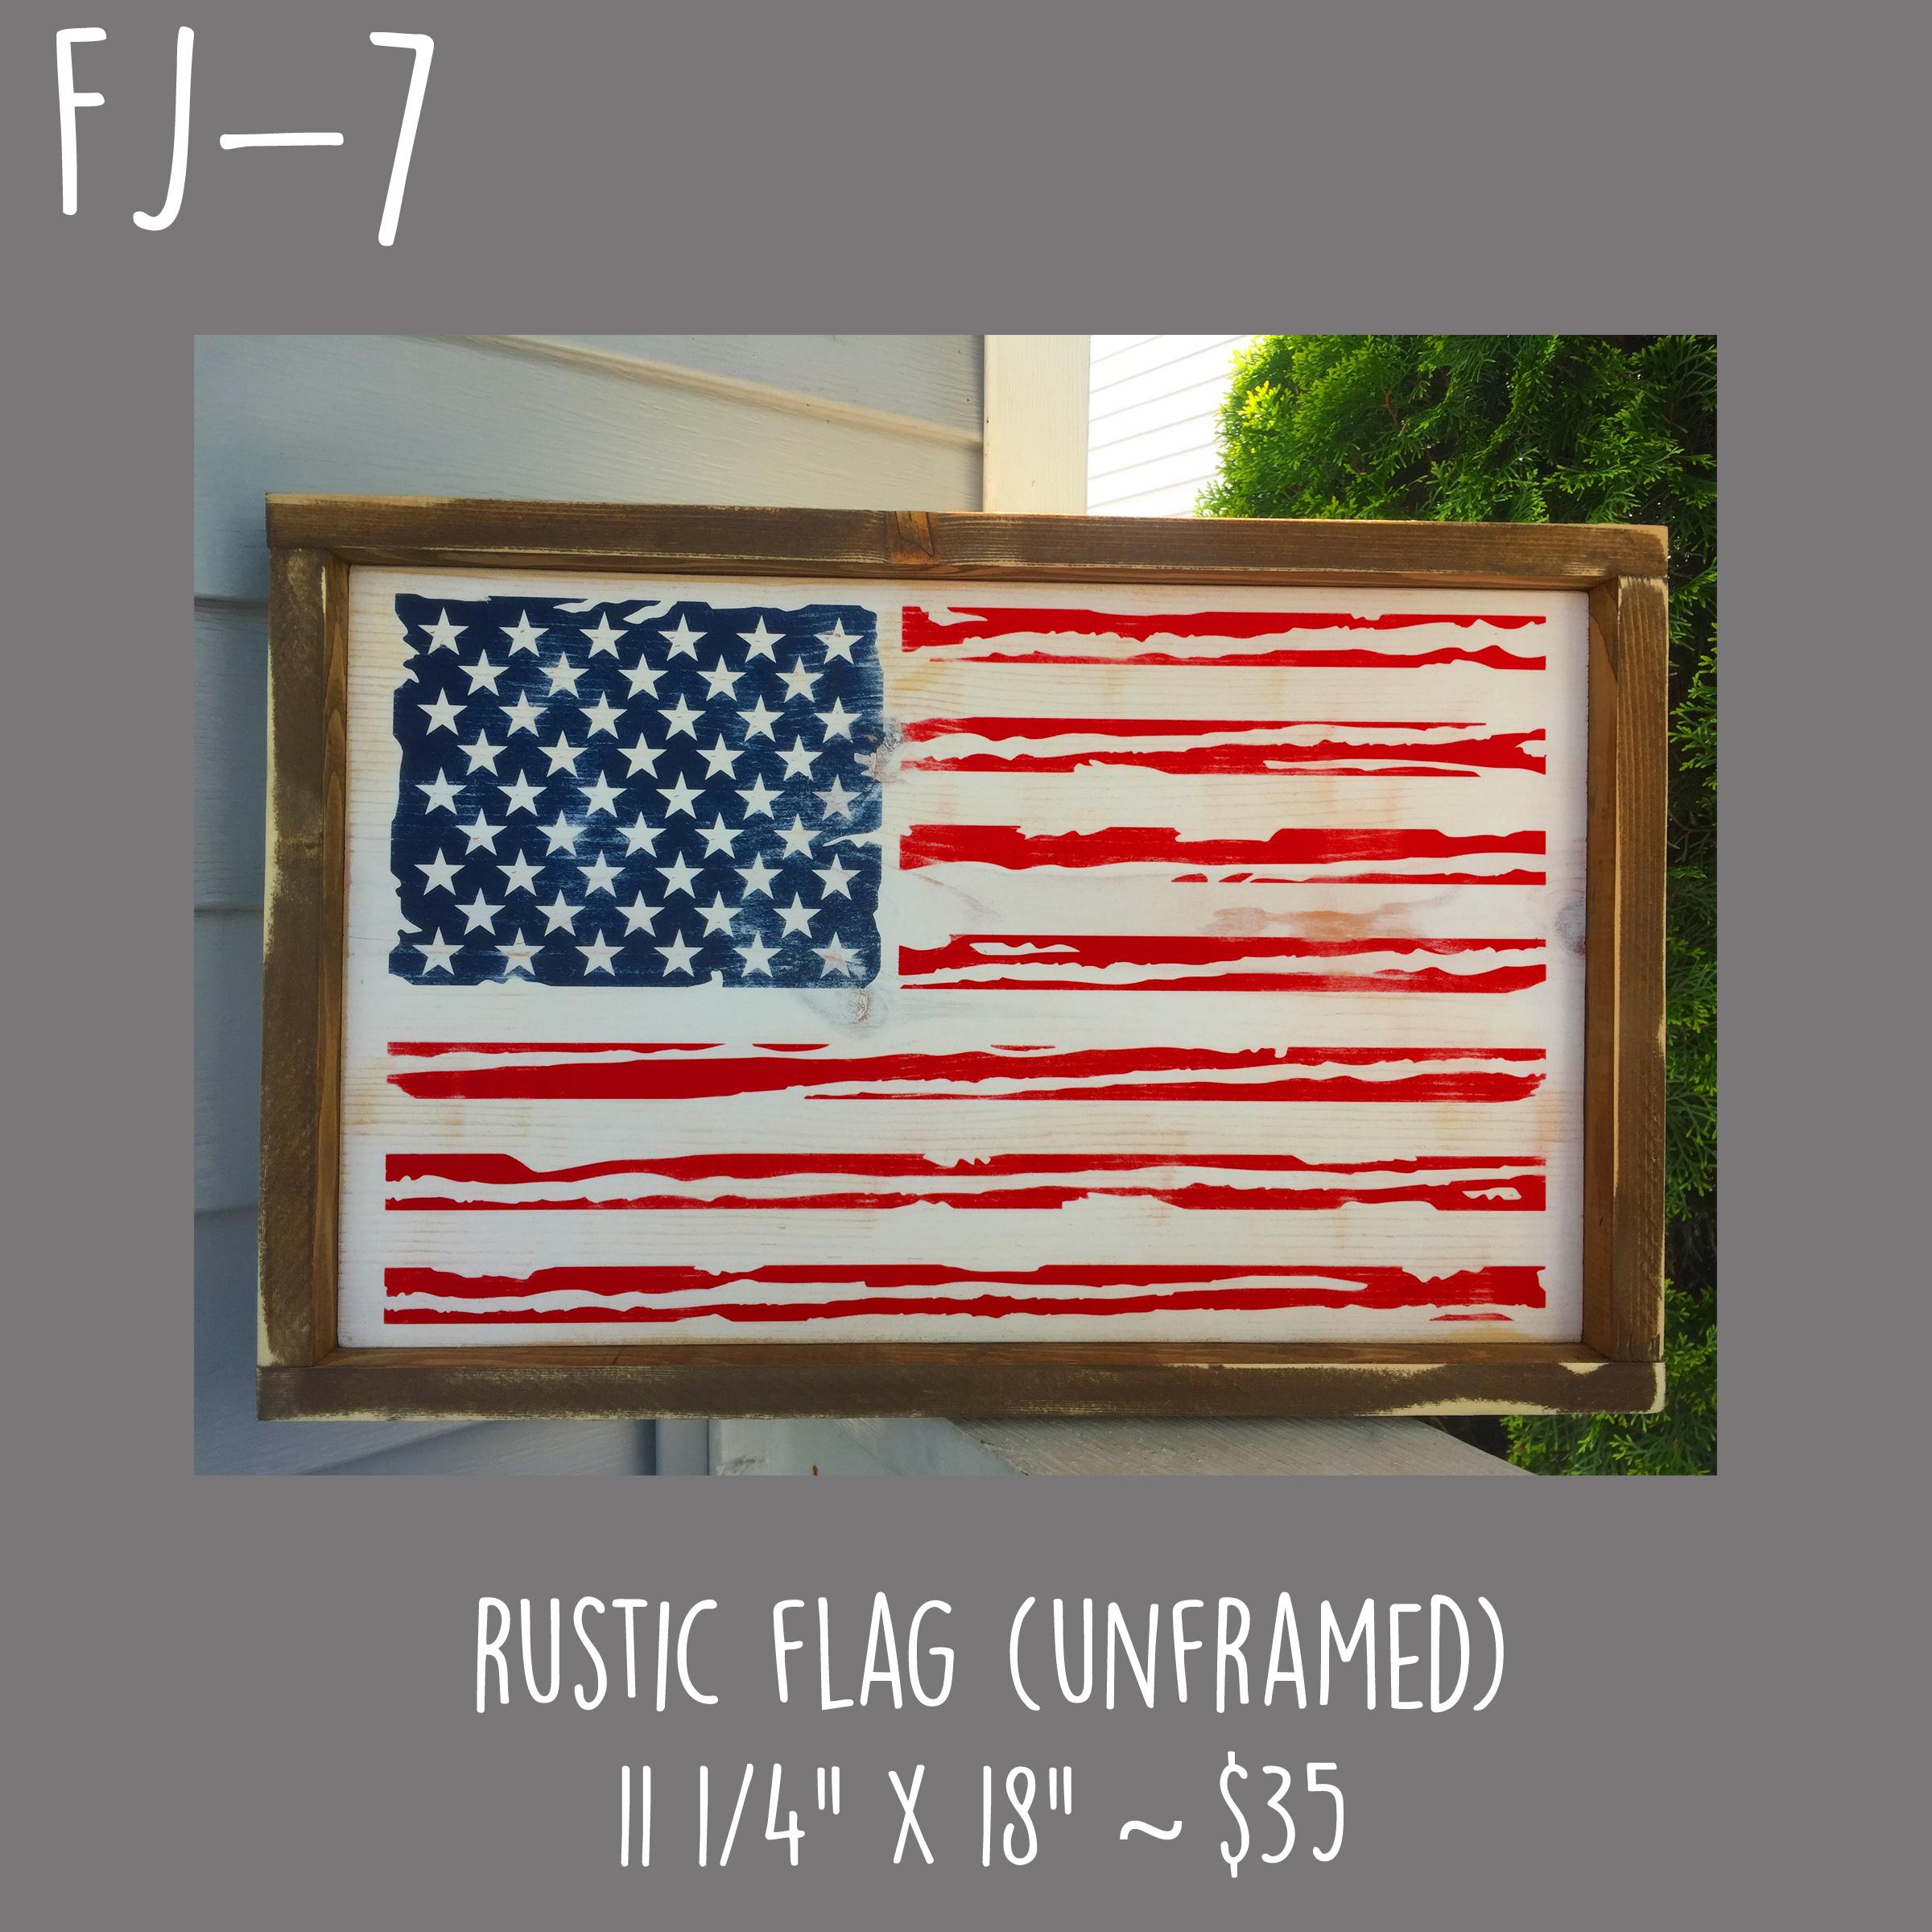 FJ7 - Rustic Flag.jpg